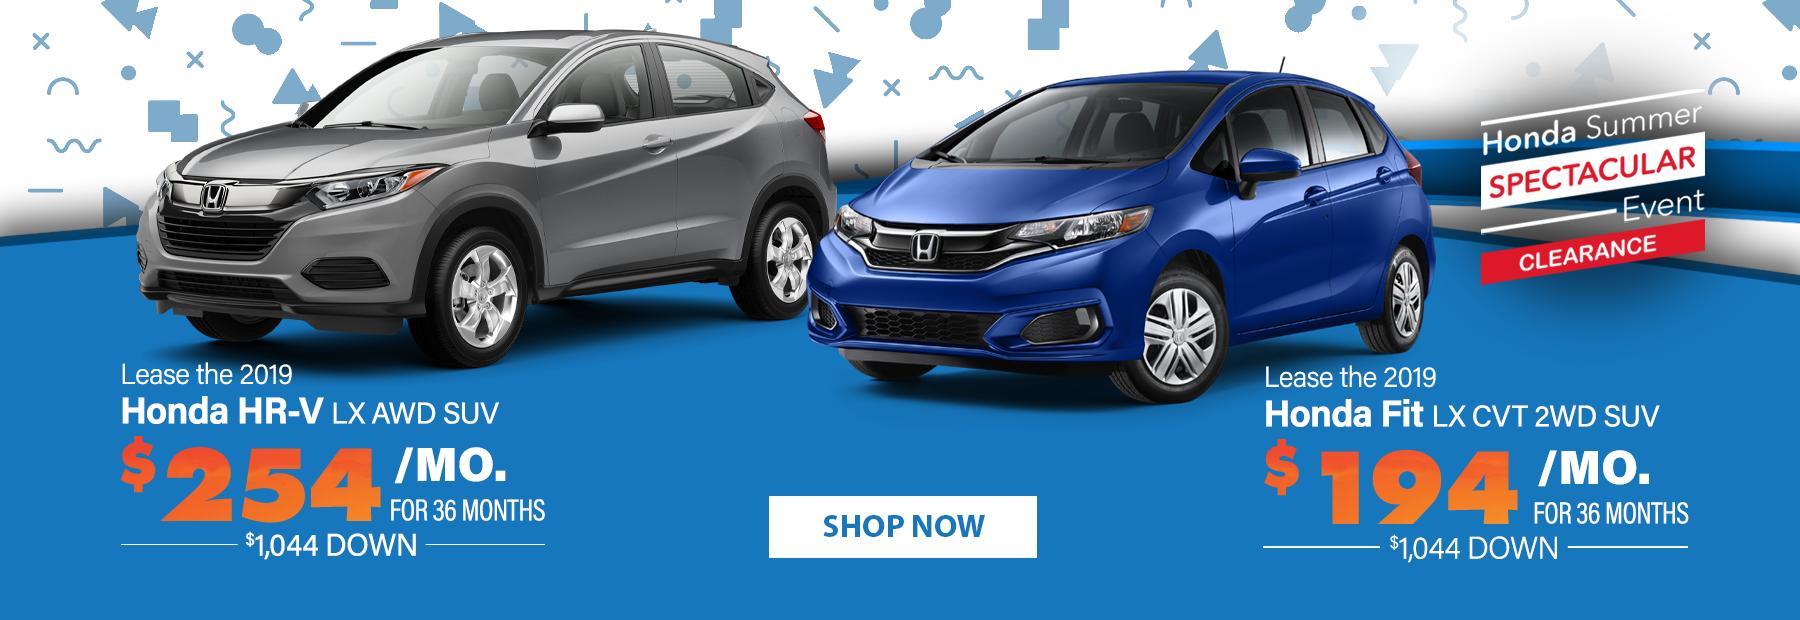 Honda Dealers Cincinnati >> Performance Honda New Honda Sales Service Route 4 In Fairfield Oh